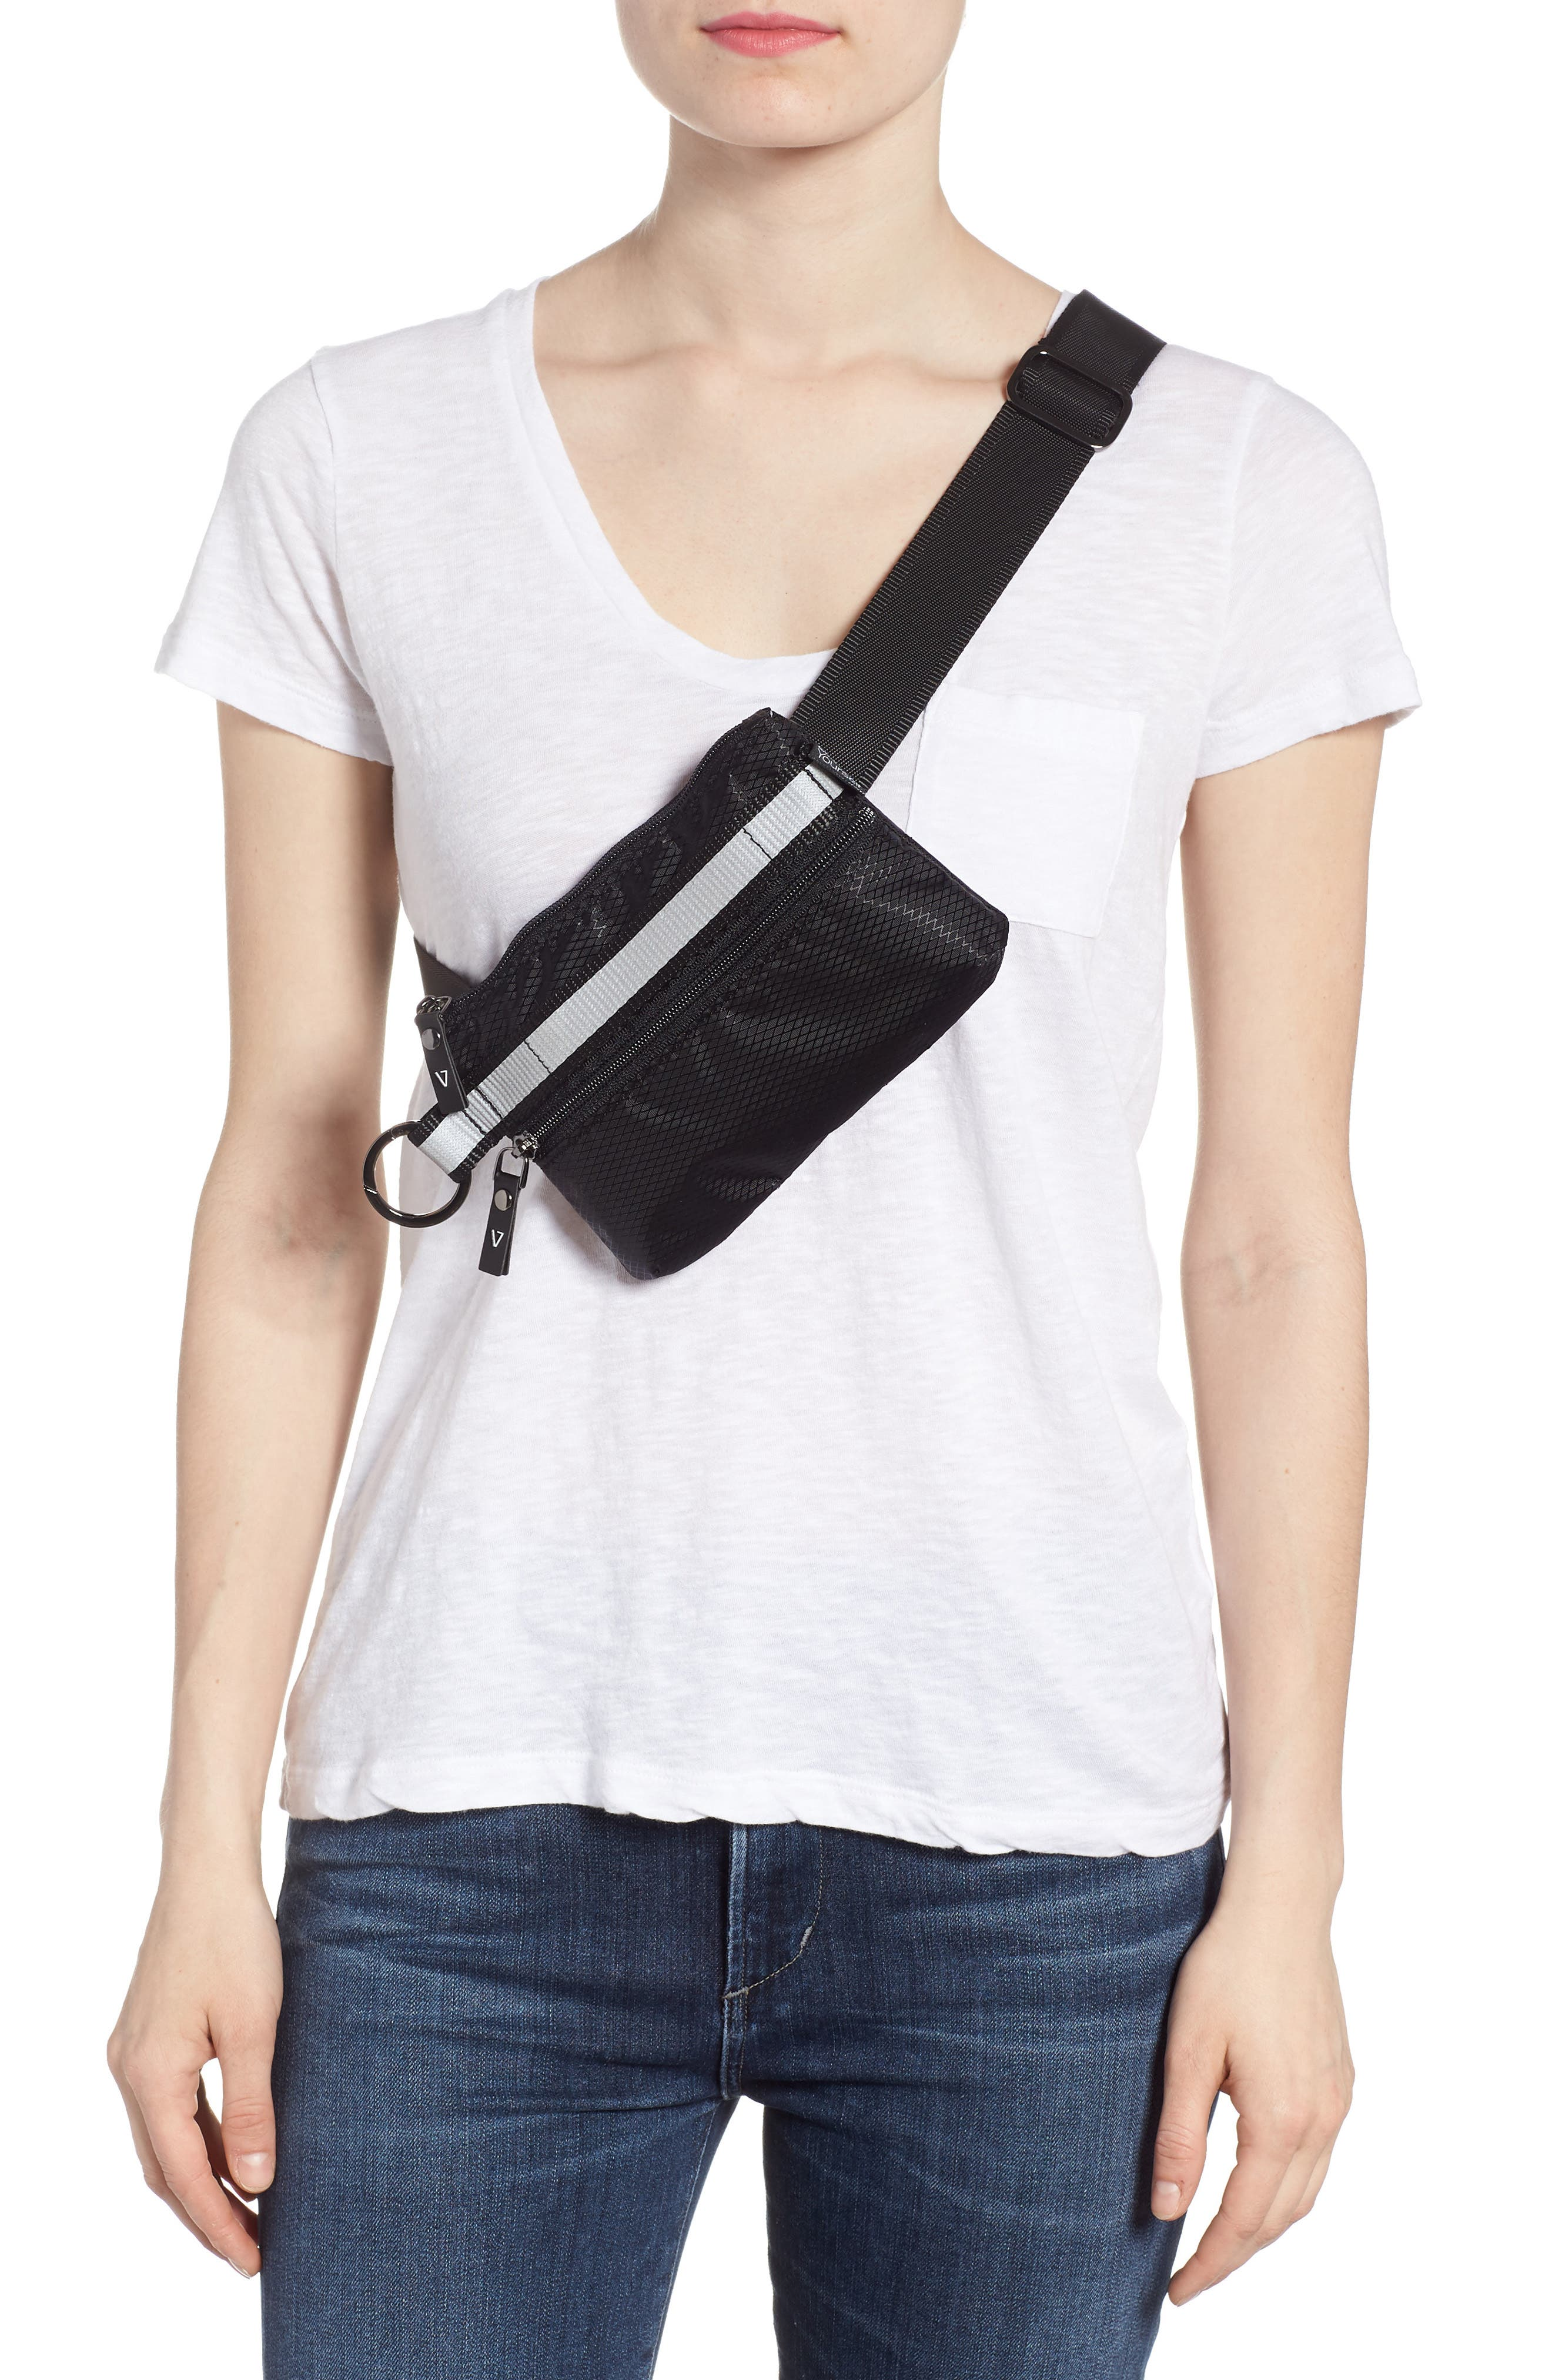 Urban Clutch Convertible Belt Bag,                             Alternate thumbnail 3, color,                             BLACK/ REFLECTIVE STRIPE